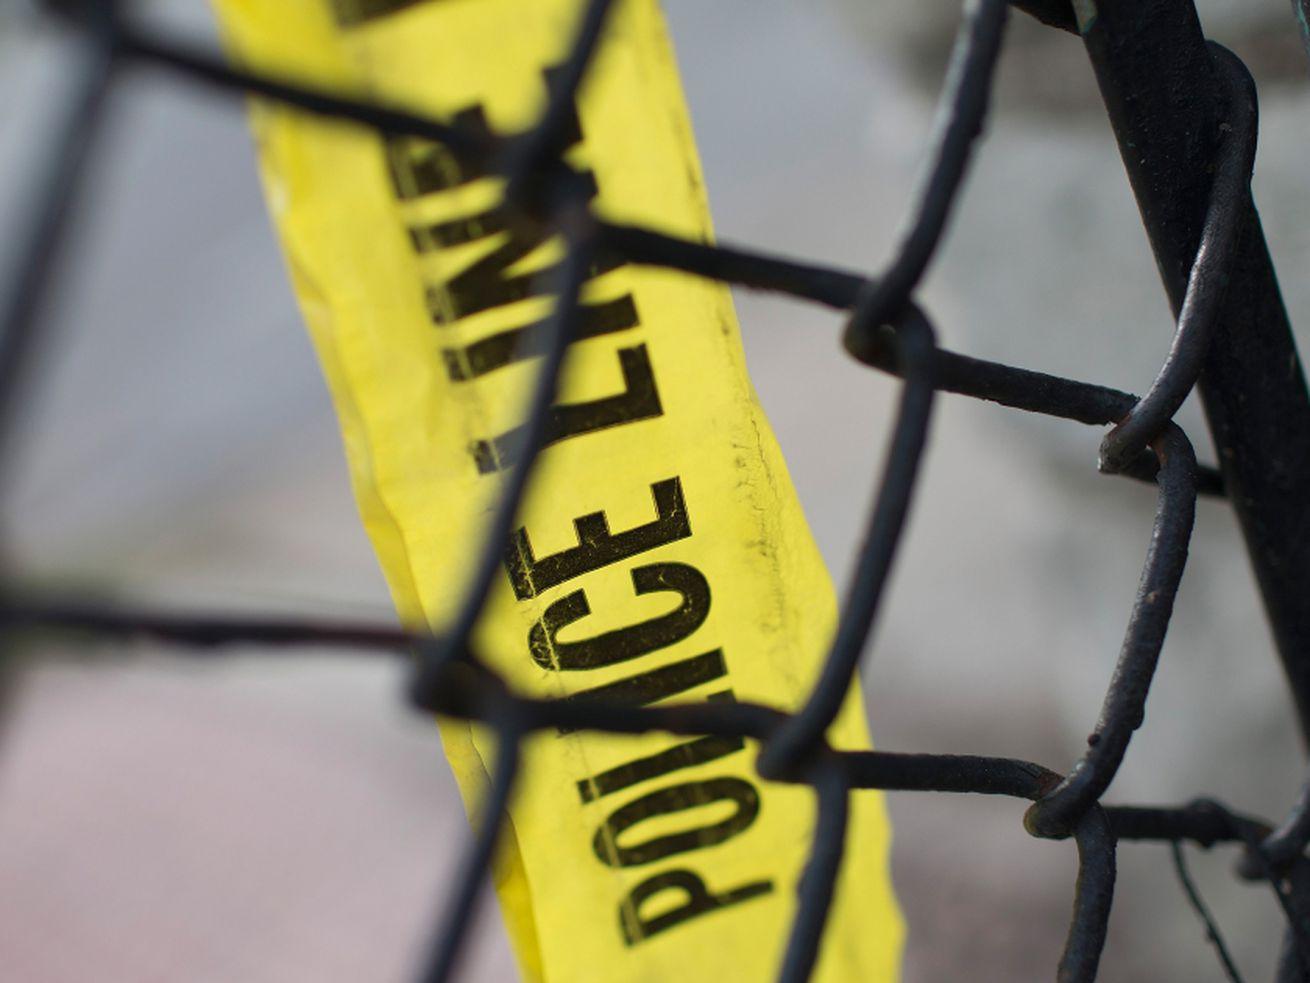 A 14-year-old boy was shot July 21, 2021 in West Garfield Park.